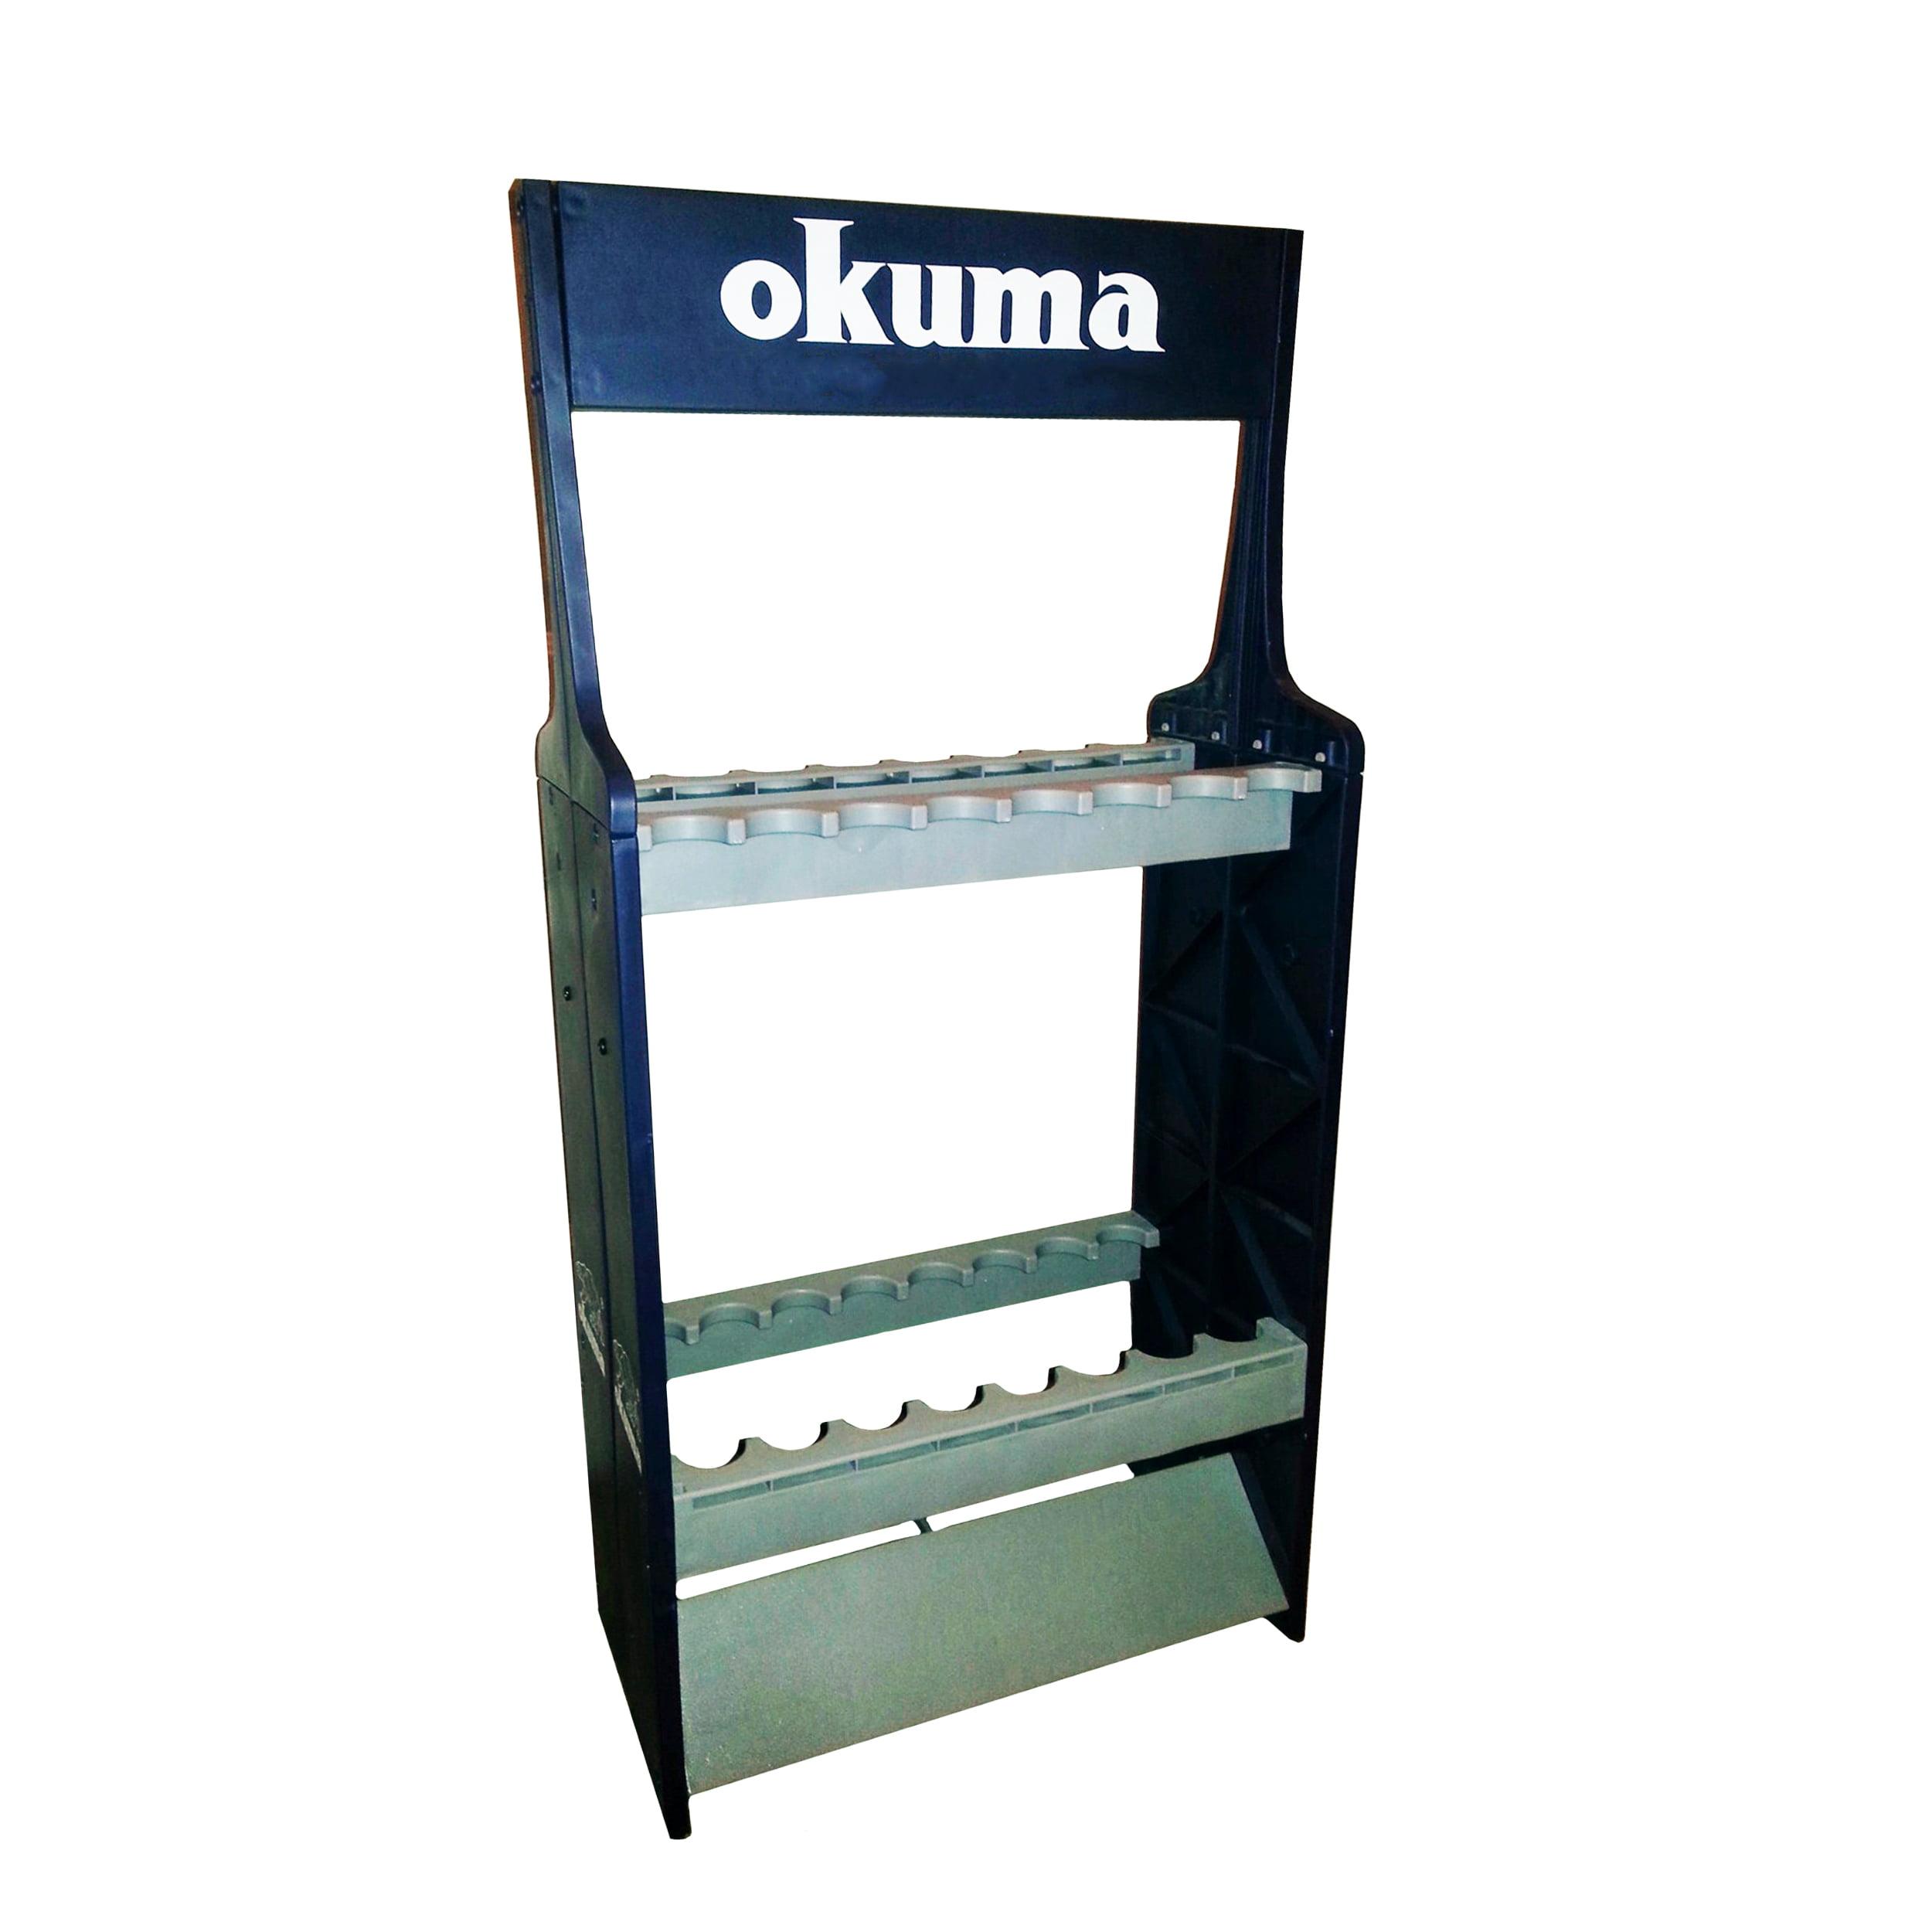 Okuma Expandable ABS Rod Rack by Okuma